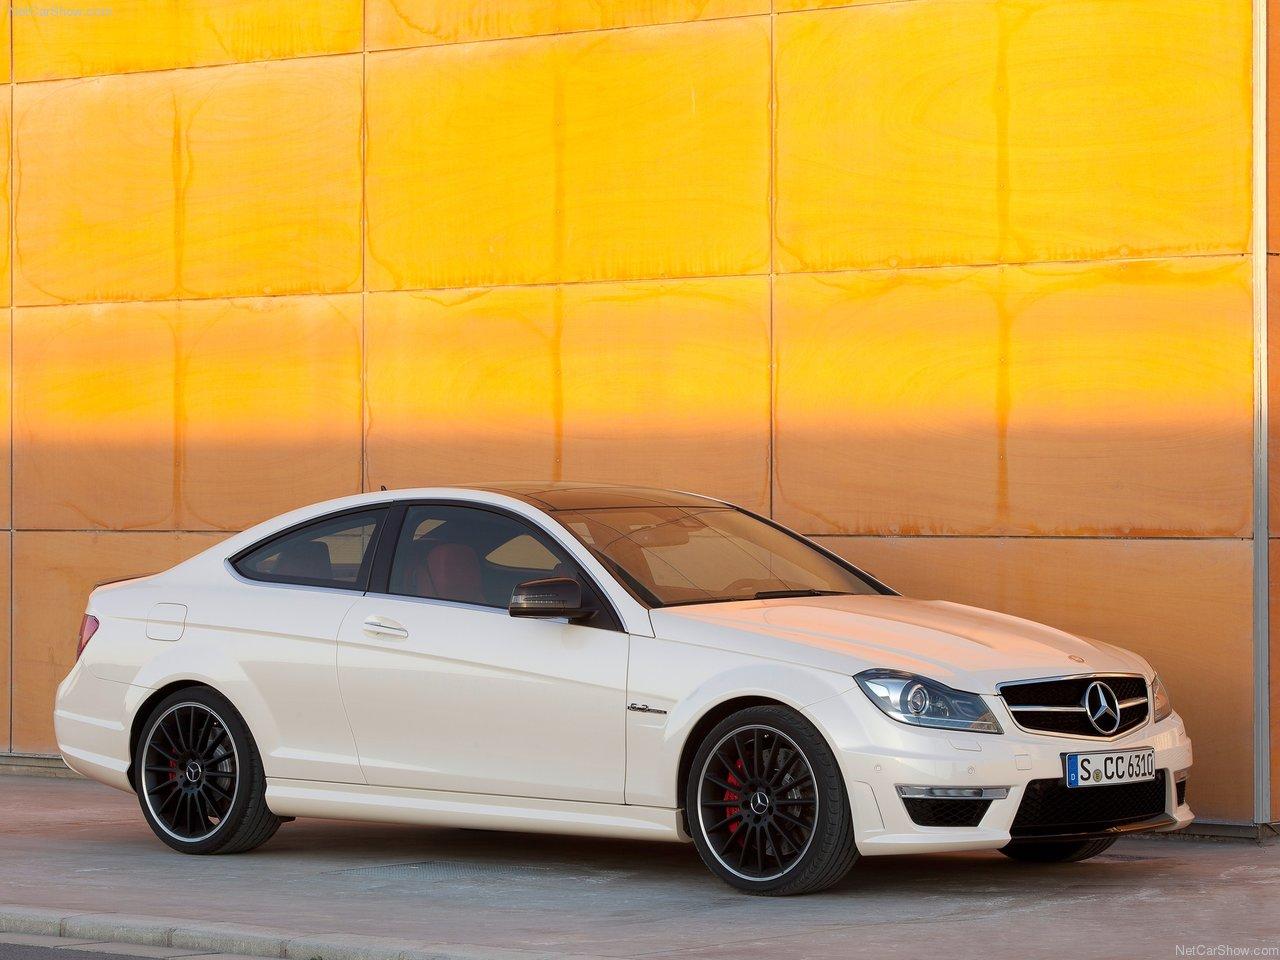 http://4.bp.blogspot.com/-R-Nykgj9Uaw/TYYUWfraKkI/AAAAAAACMI0/MRjNHsXDOqY/s1600/Mercedes-Benz-C63_AMG_Coupe_2012_1280x960_wallpaper_08.jpg